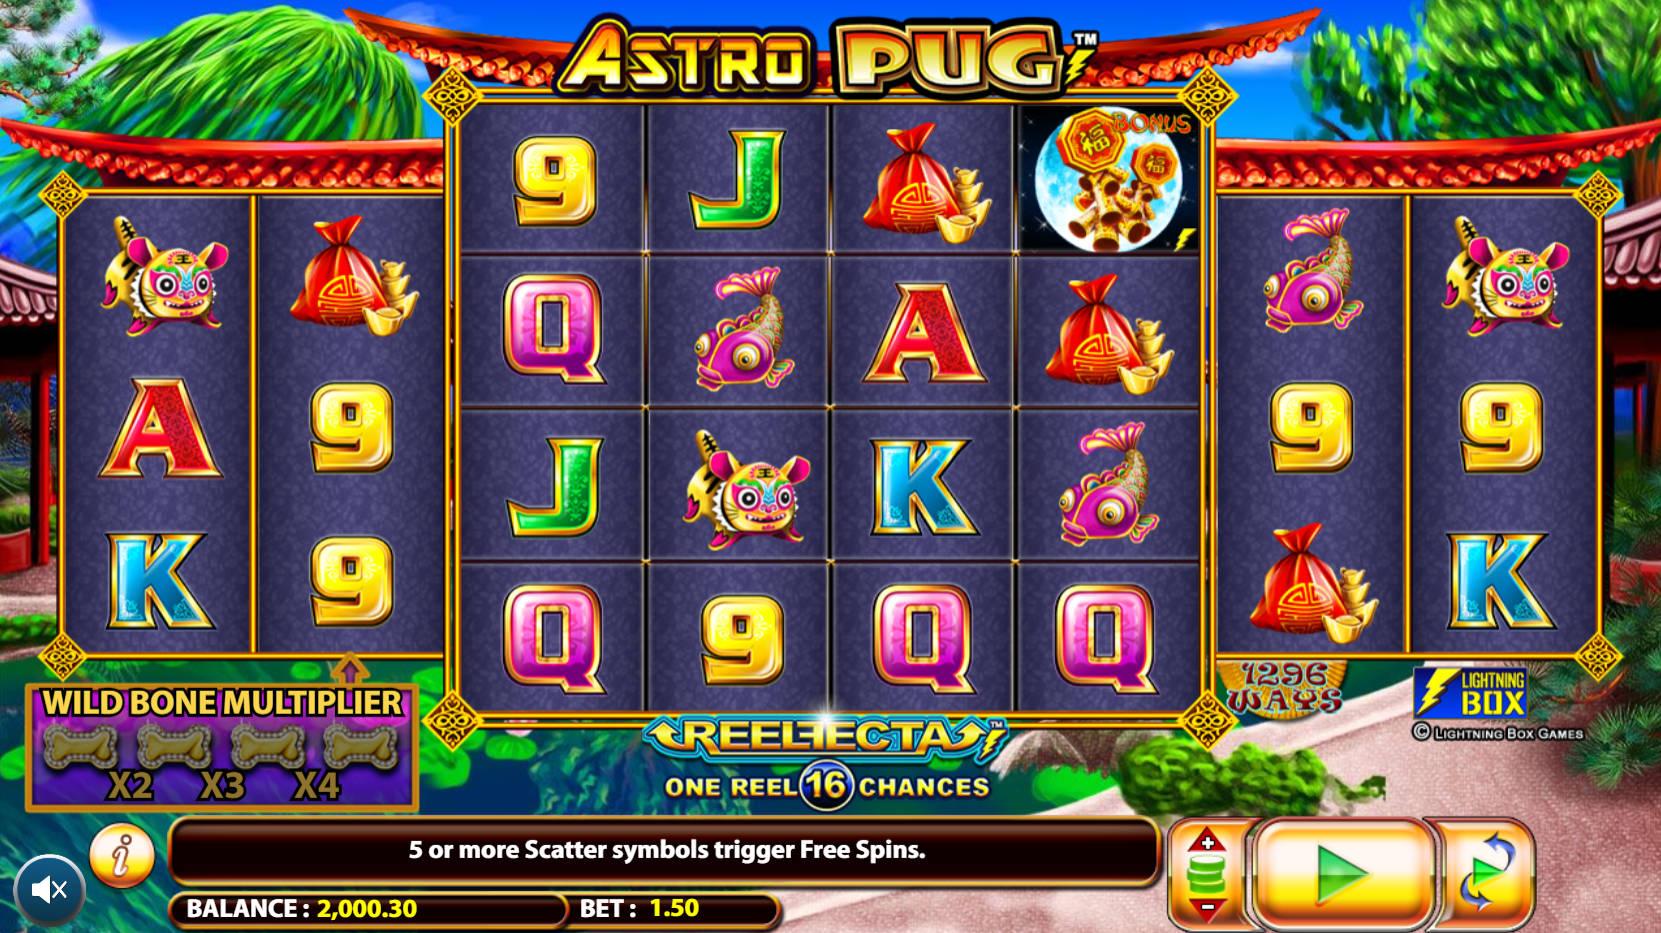 Astro Slot Machine